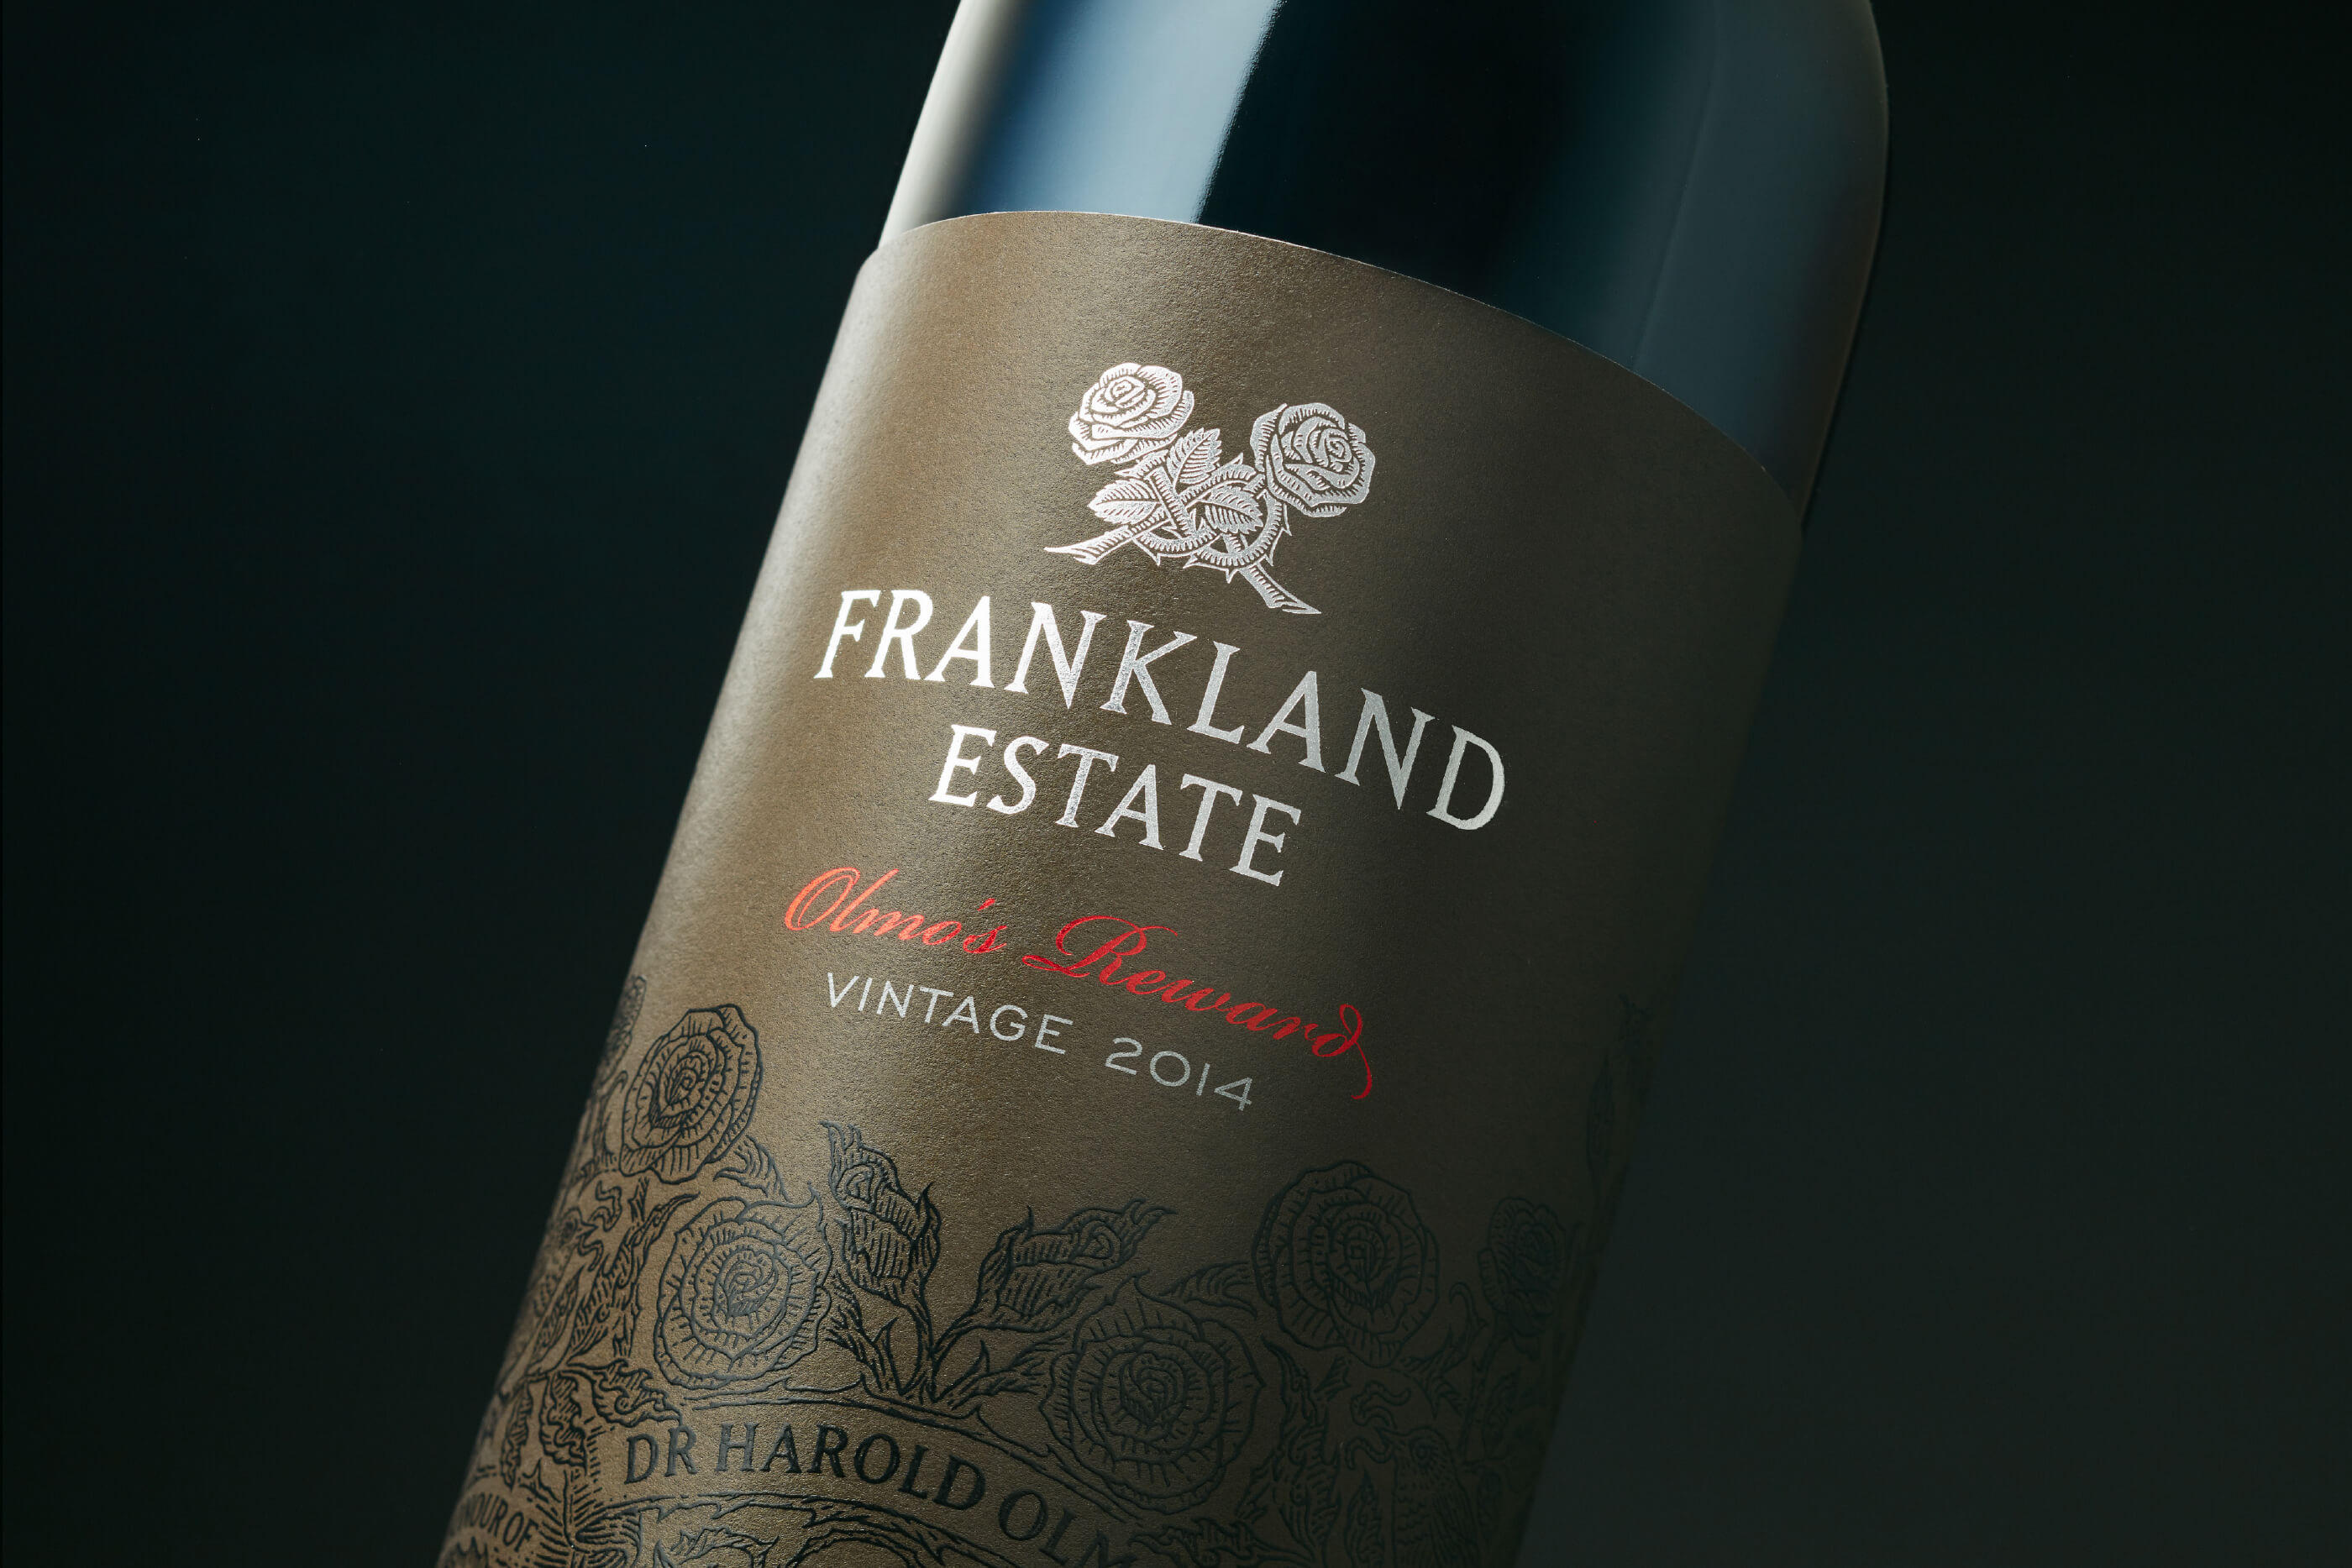 frankland_estate_olmo's